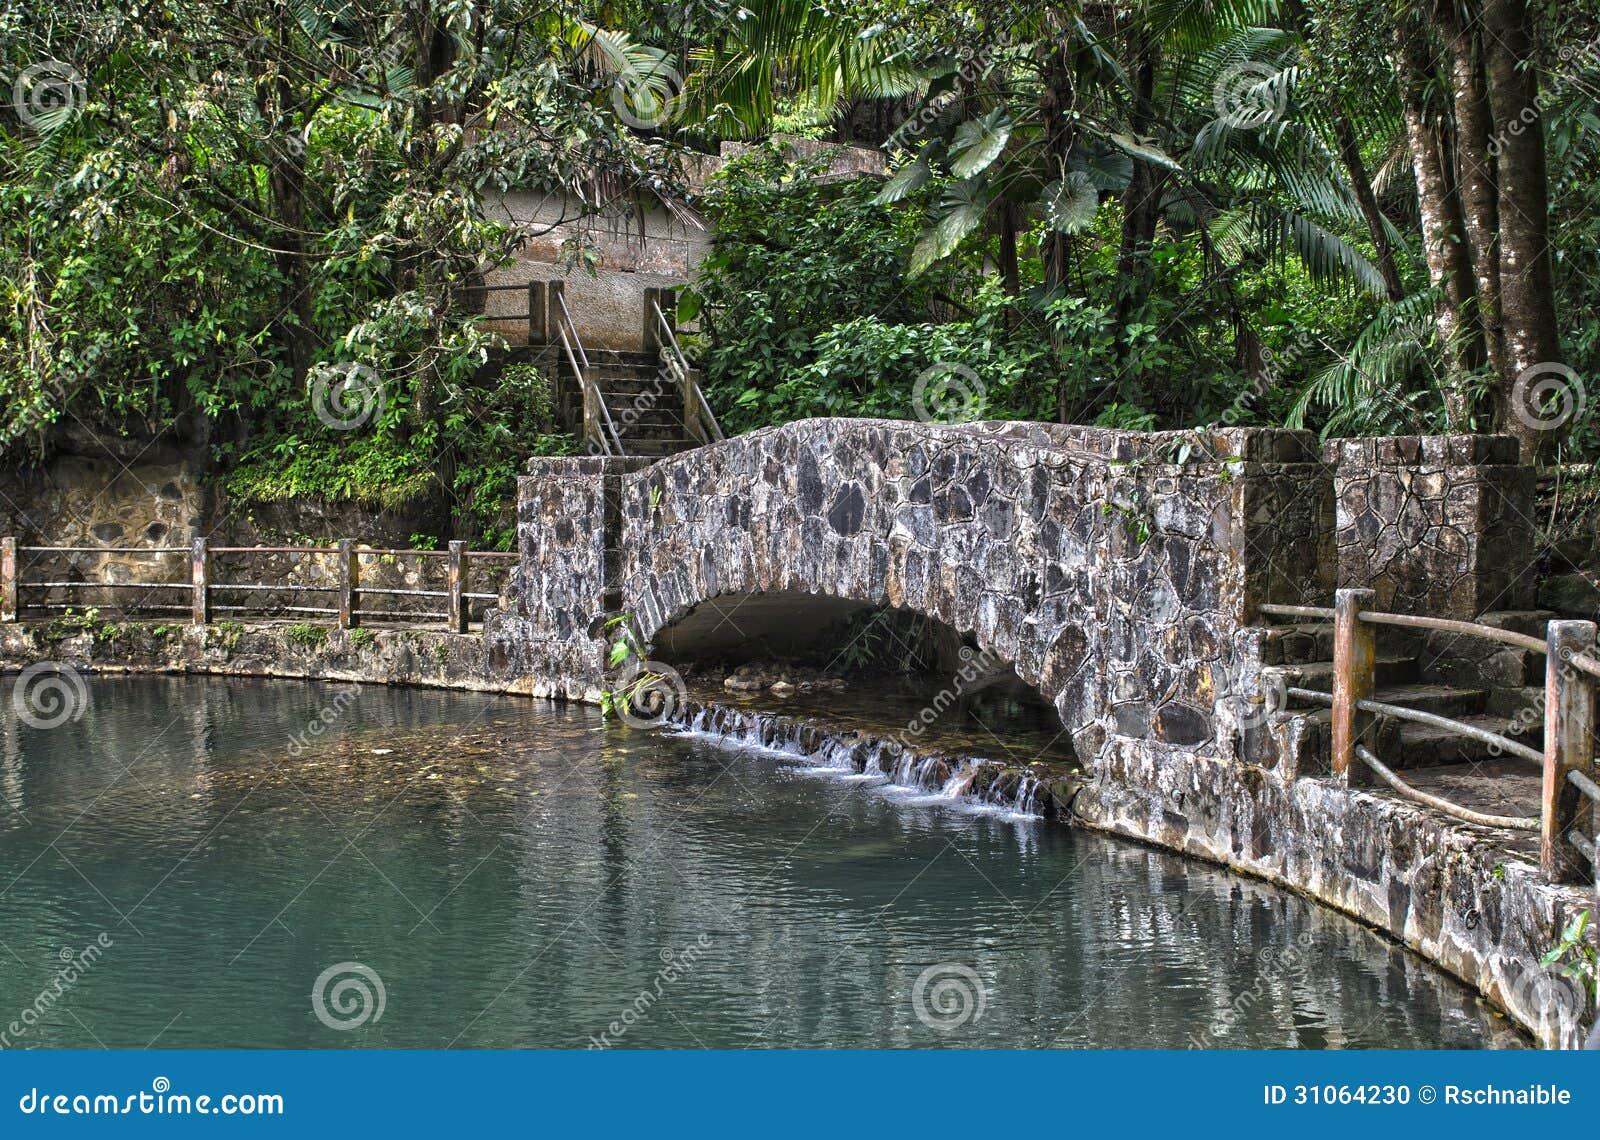 Bano grande pool stone bridge stock photo image 31064230 for Bano grande puerto rico